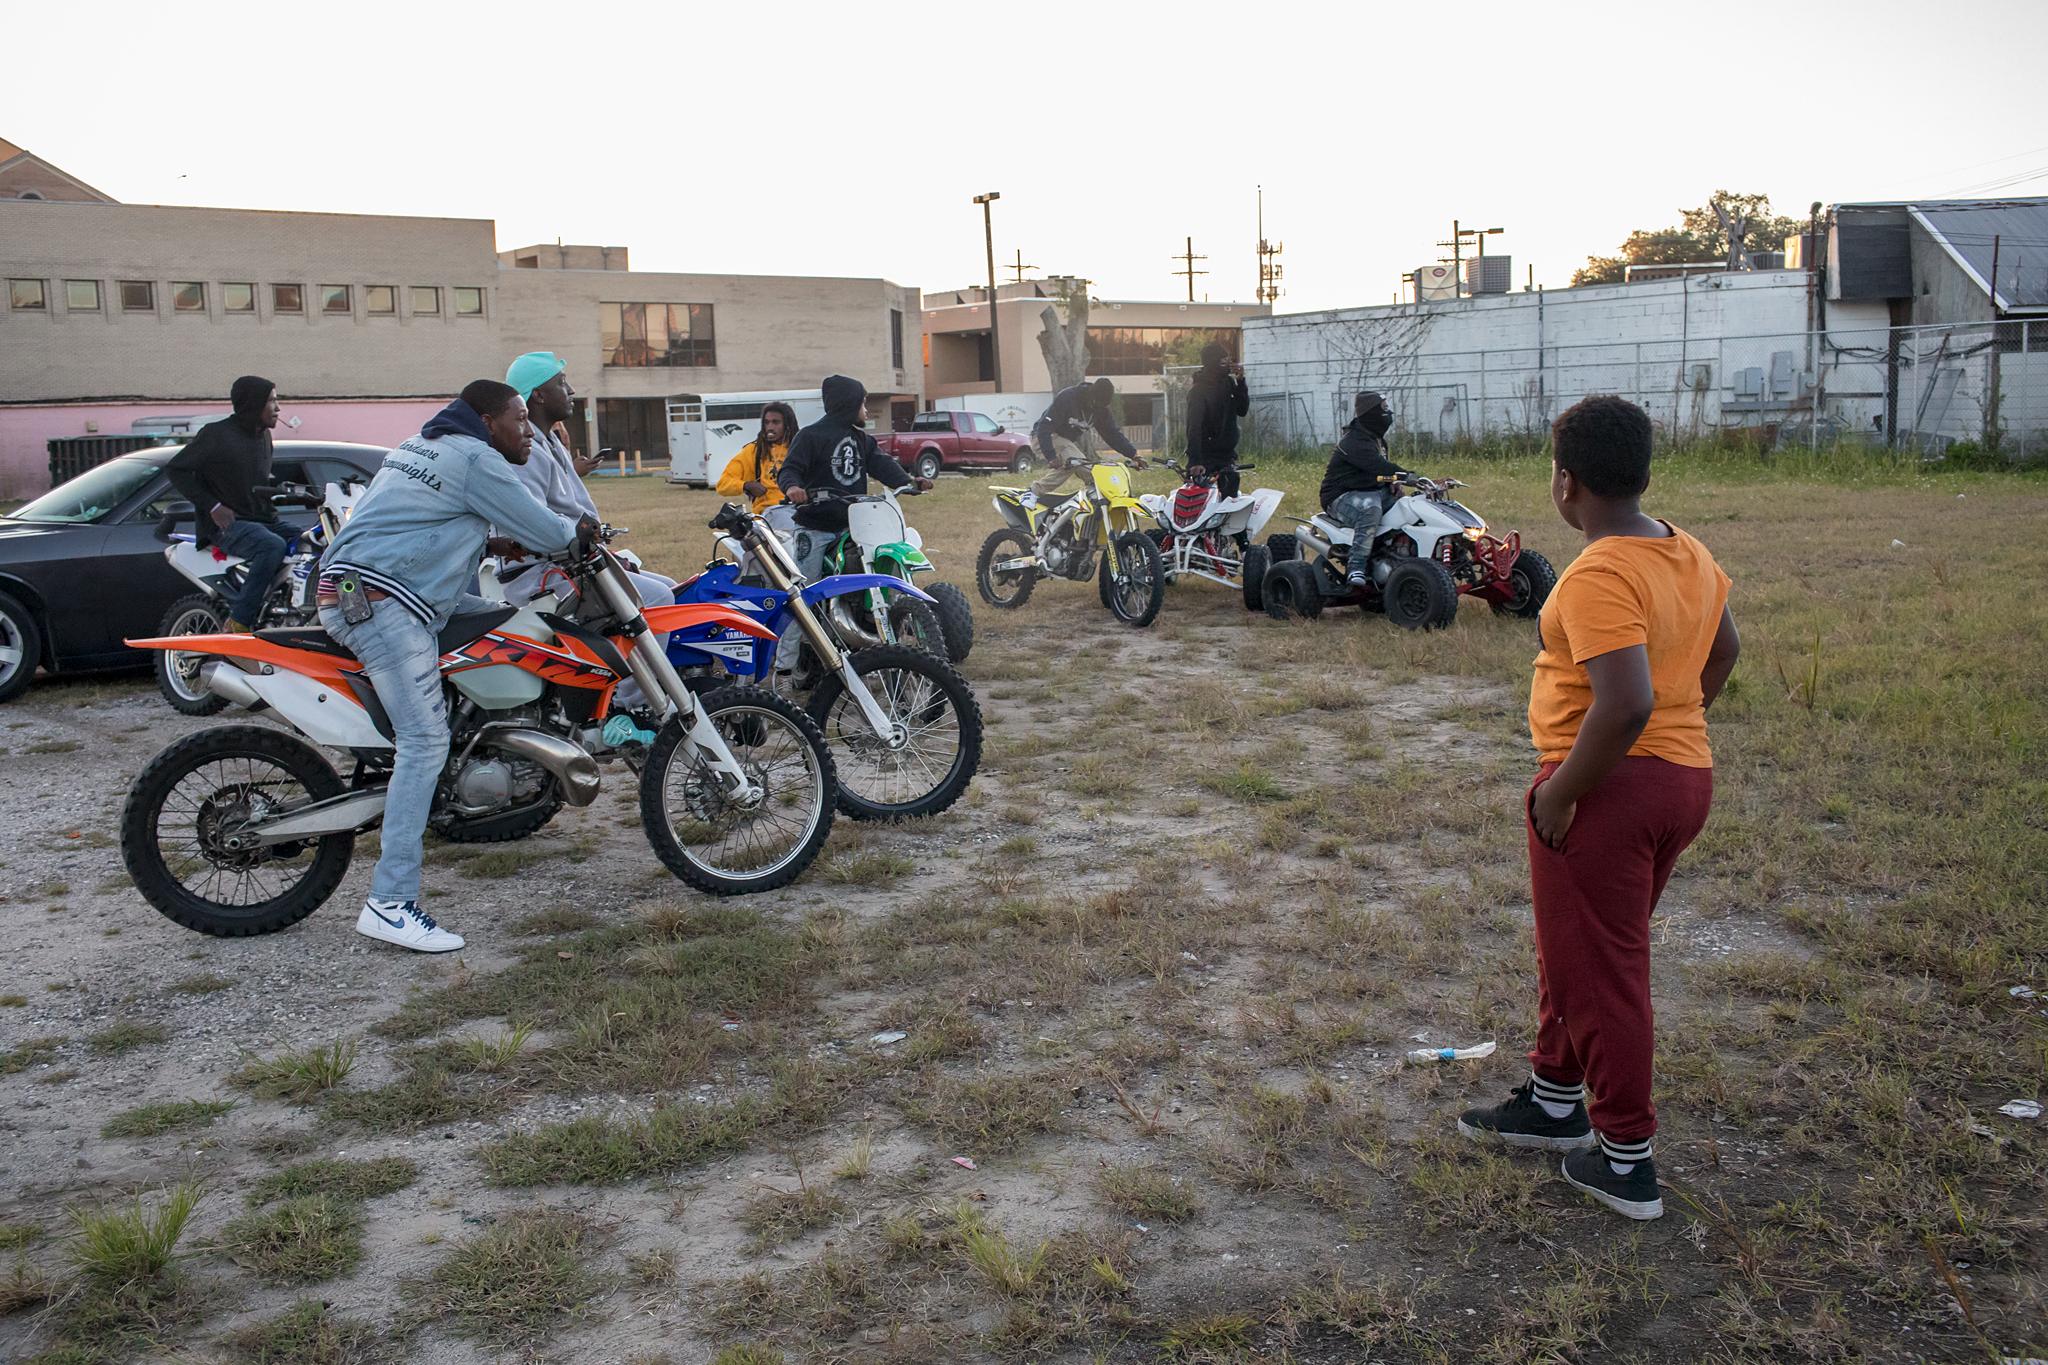 The Big Kids Got Big Bikes - New Orleans, LA